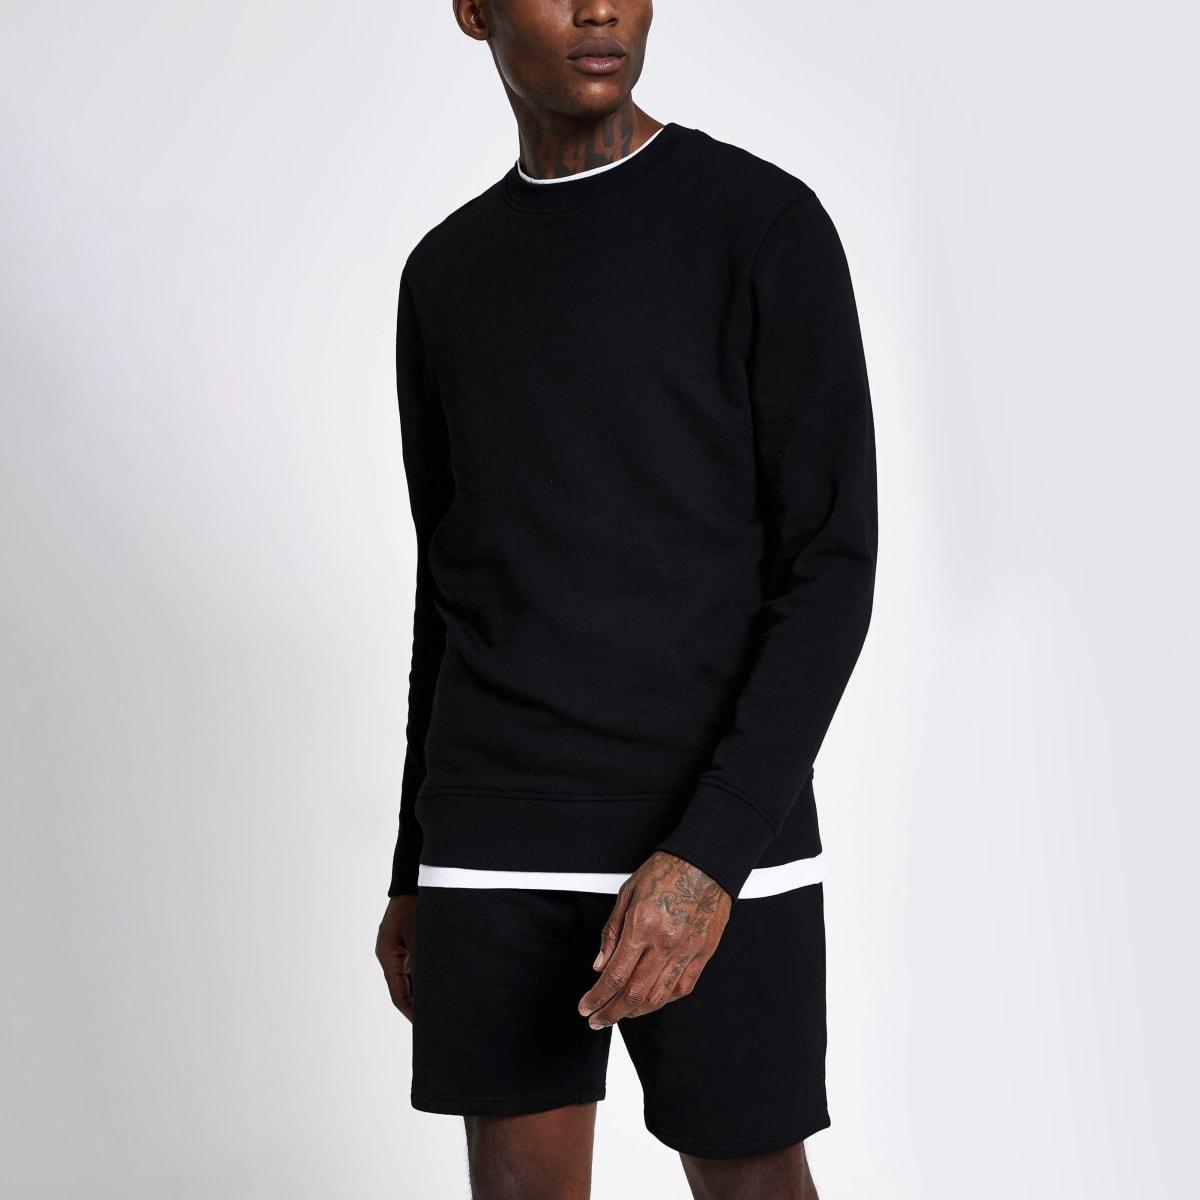 Zwarte slim-fit sweater met lange mouwen